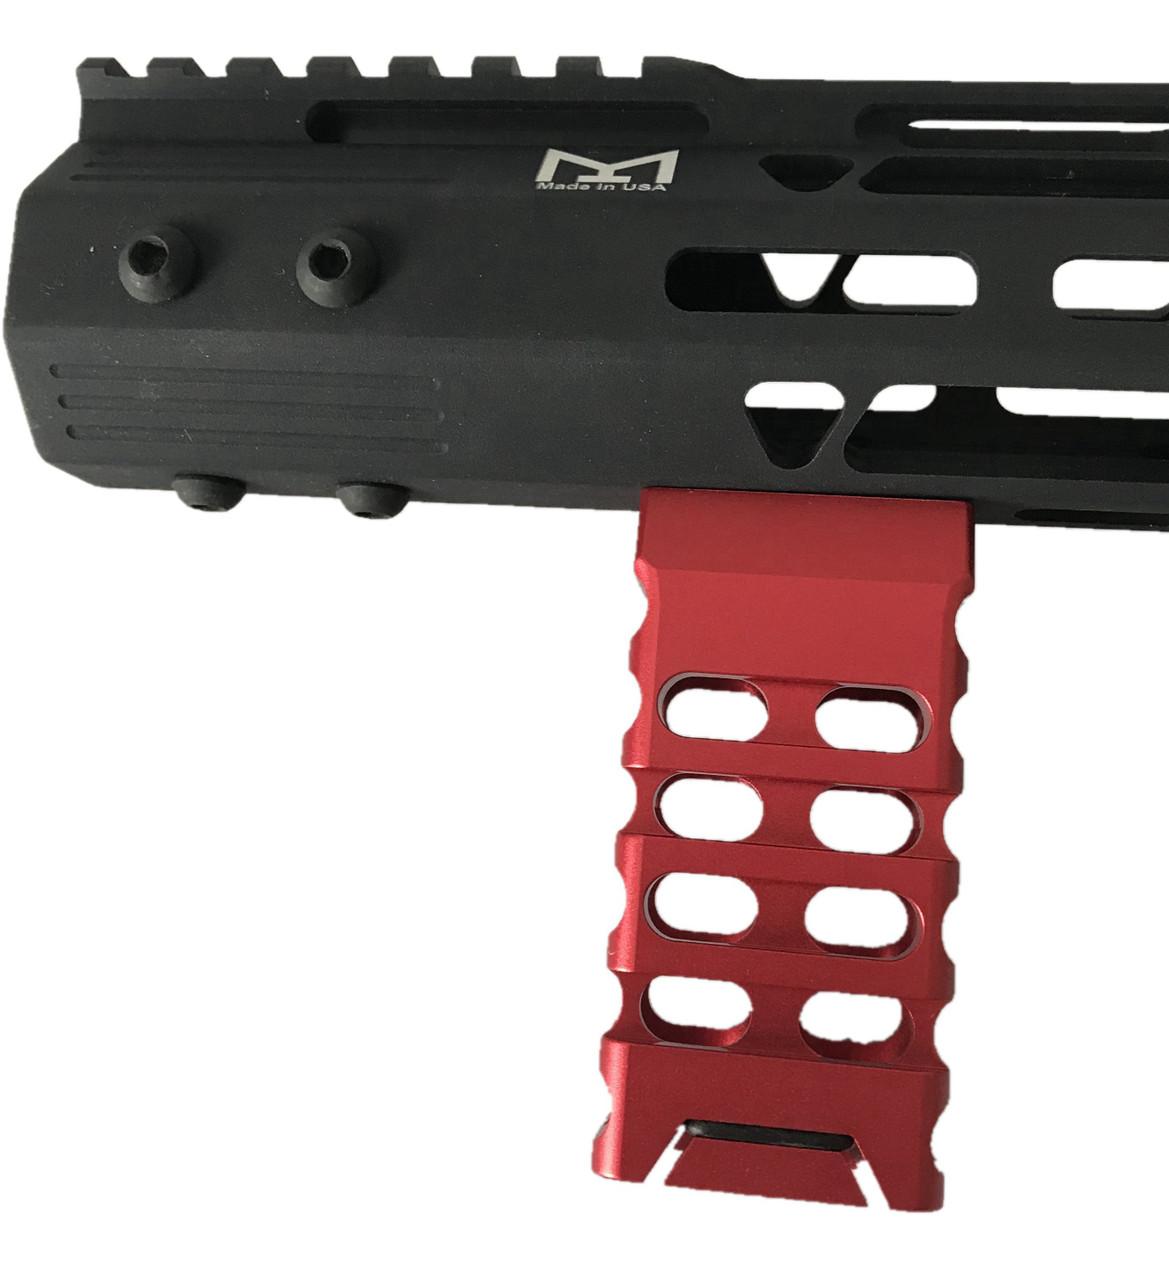 Black Aluminum Skeleton Foregrip Angle Grip for M-Lock handguards